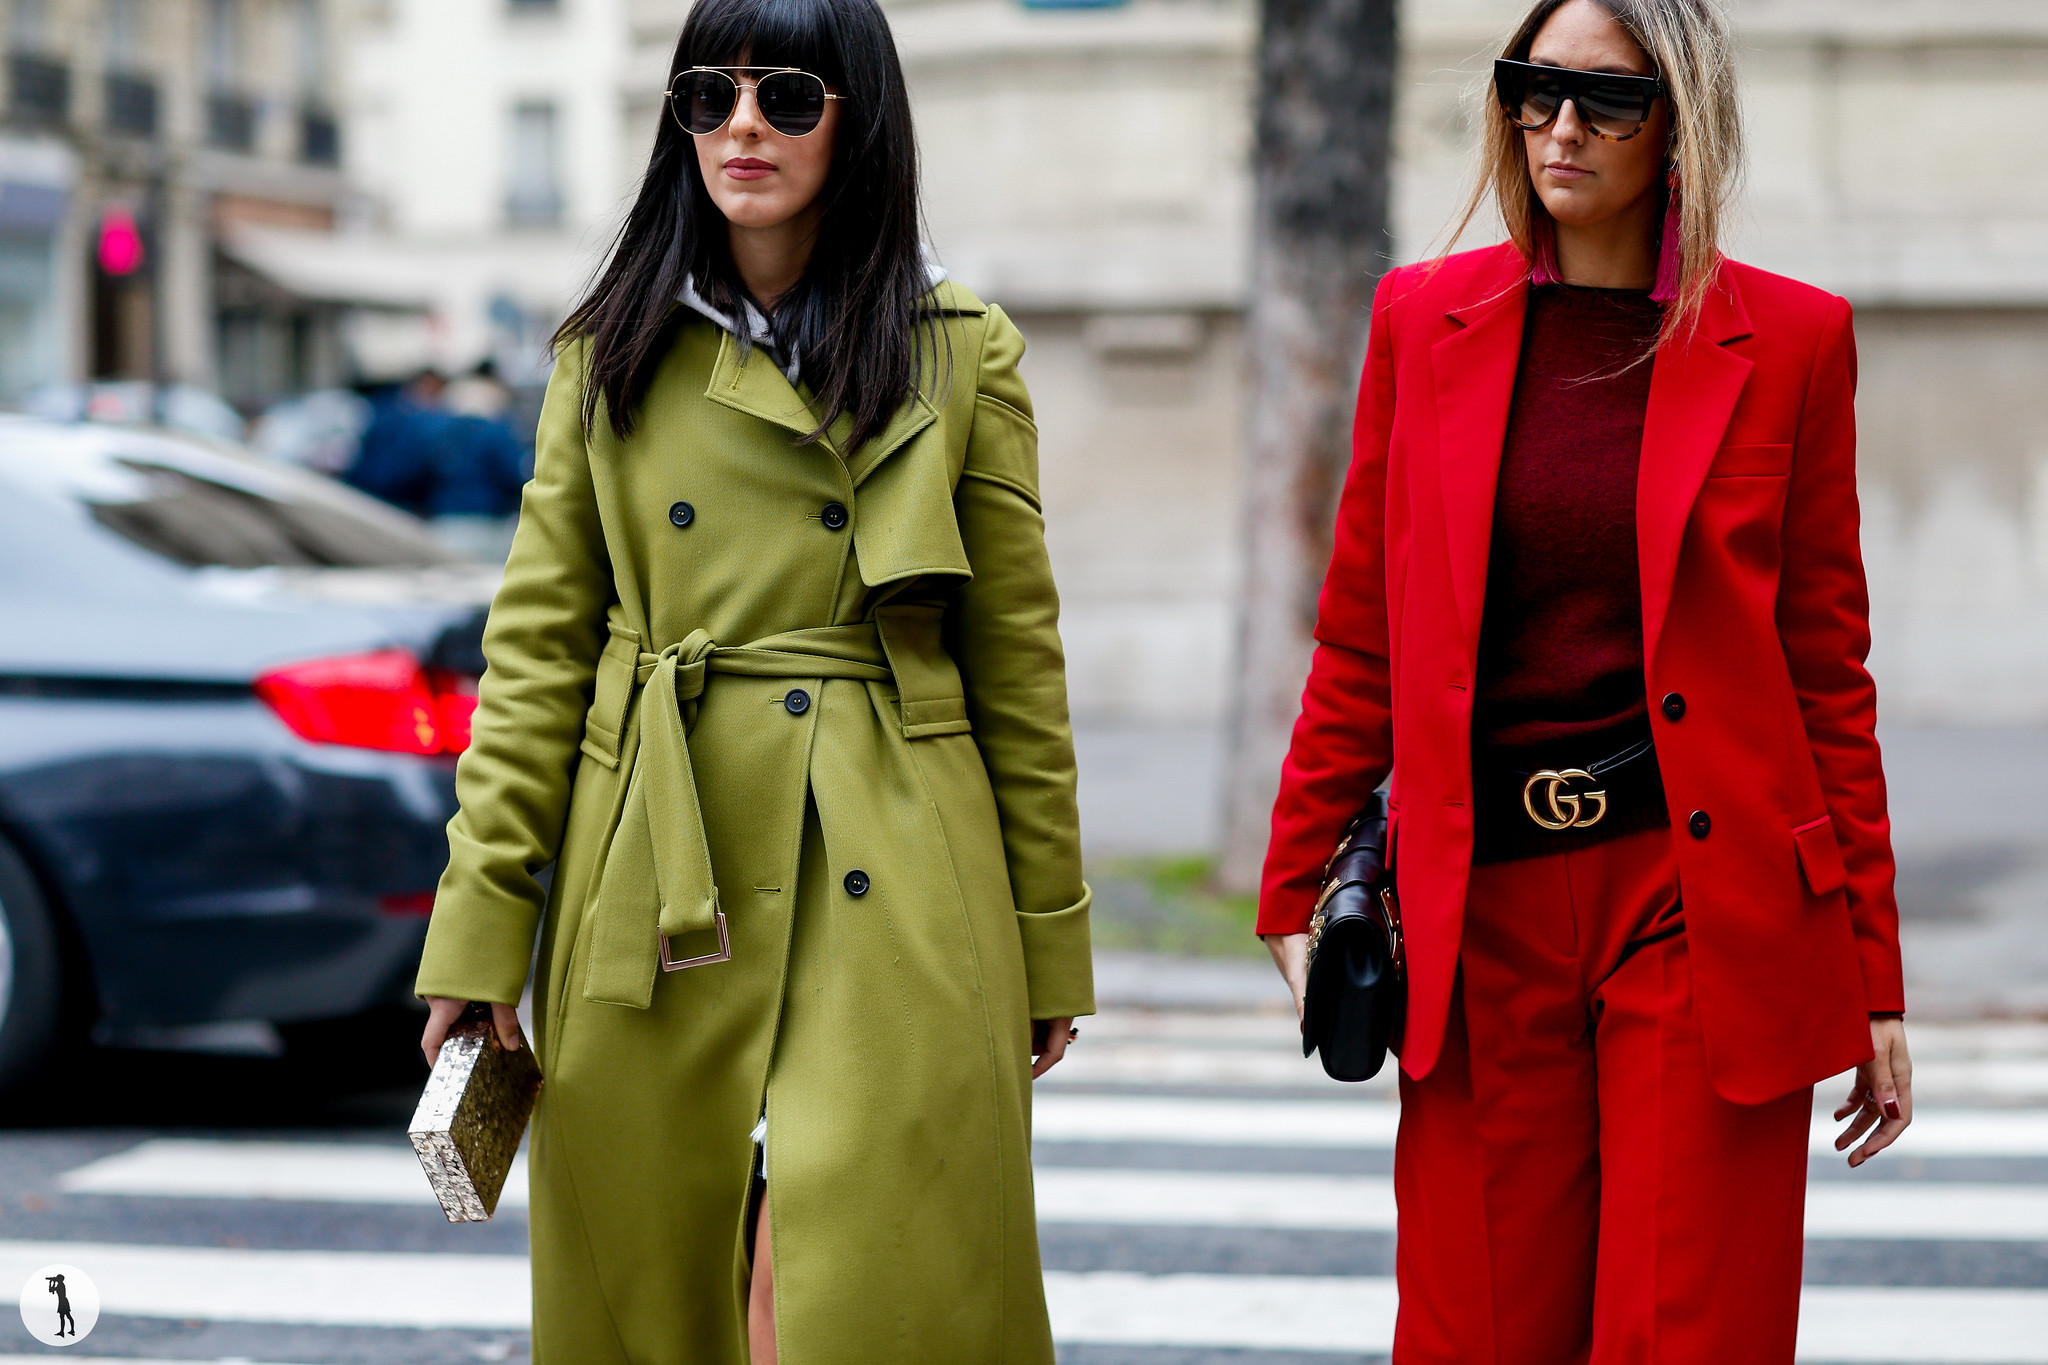 Laura Comolli and Elisa Taviti - Paris Fashion Week SS18 (2)